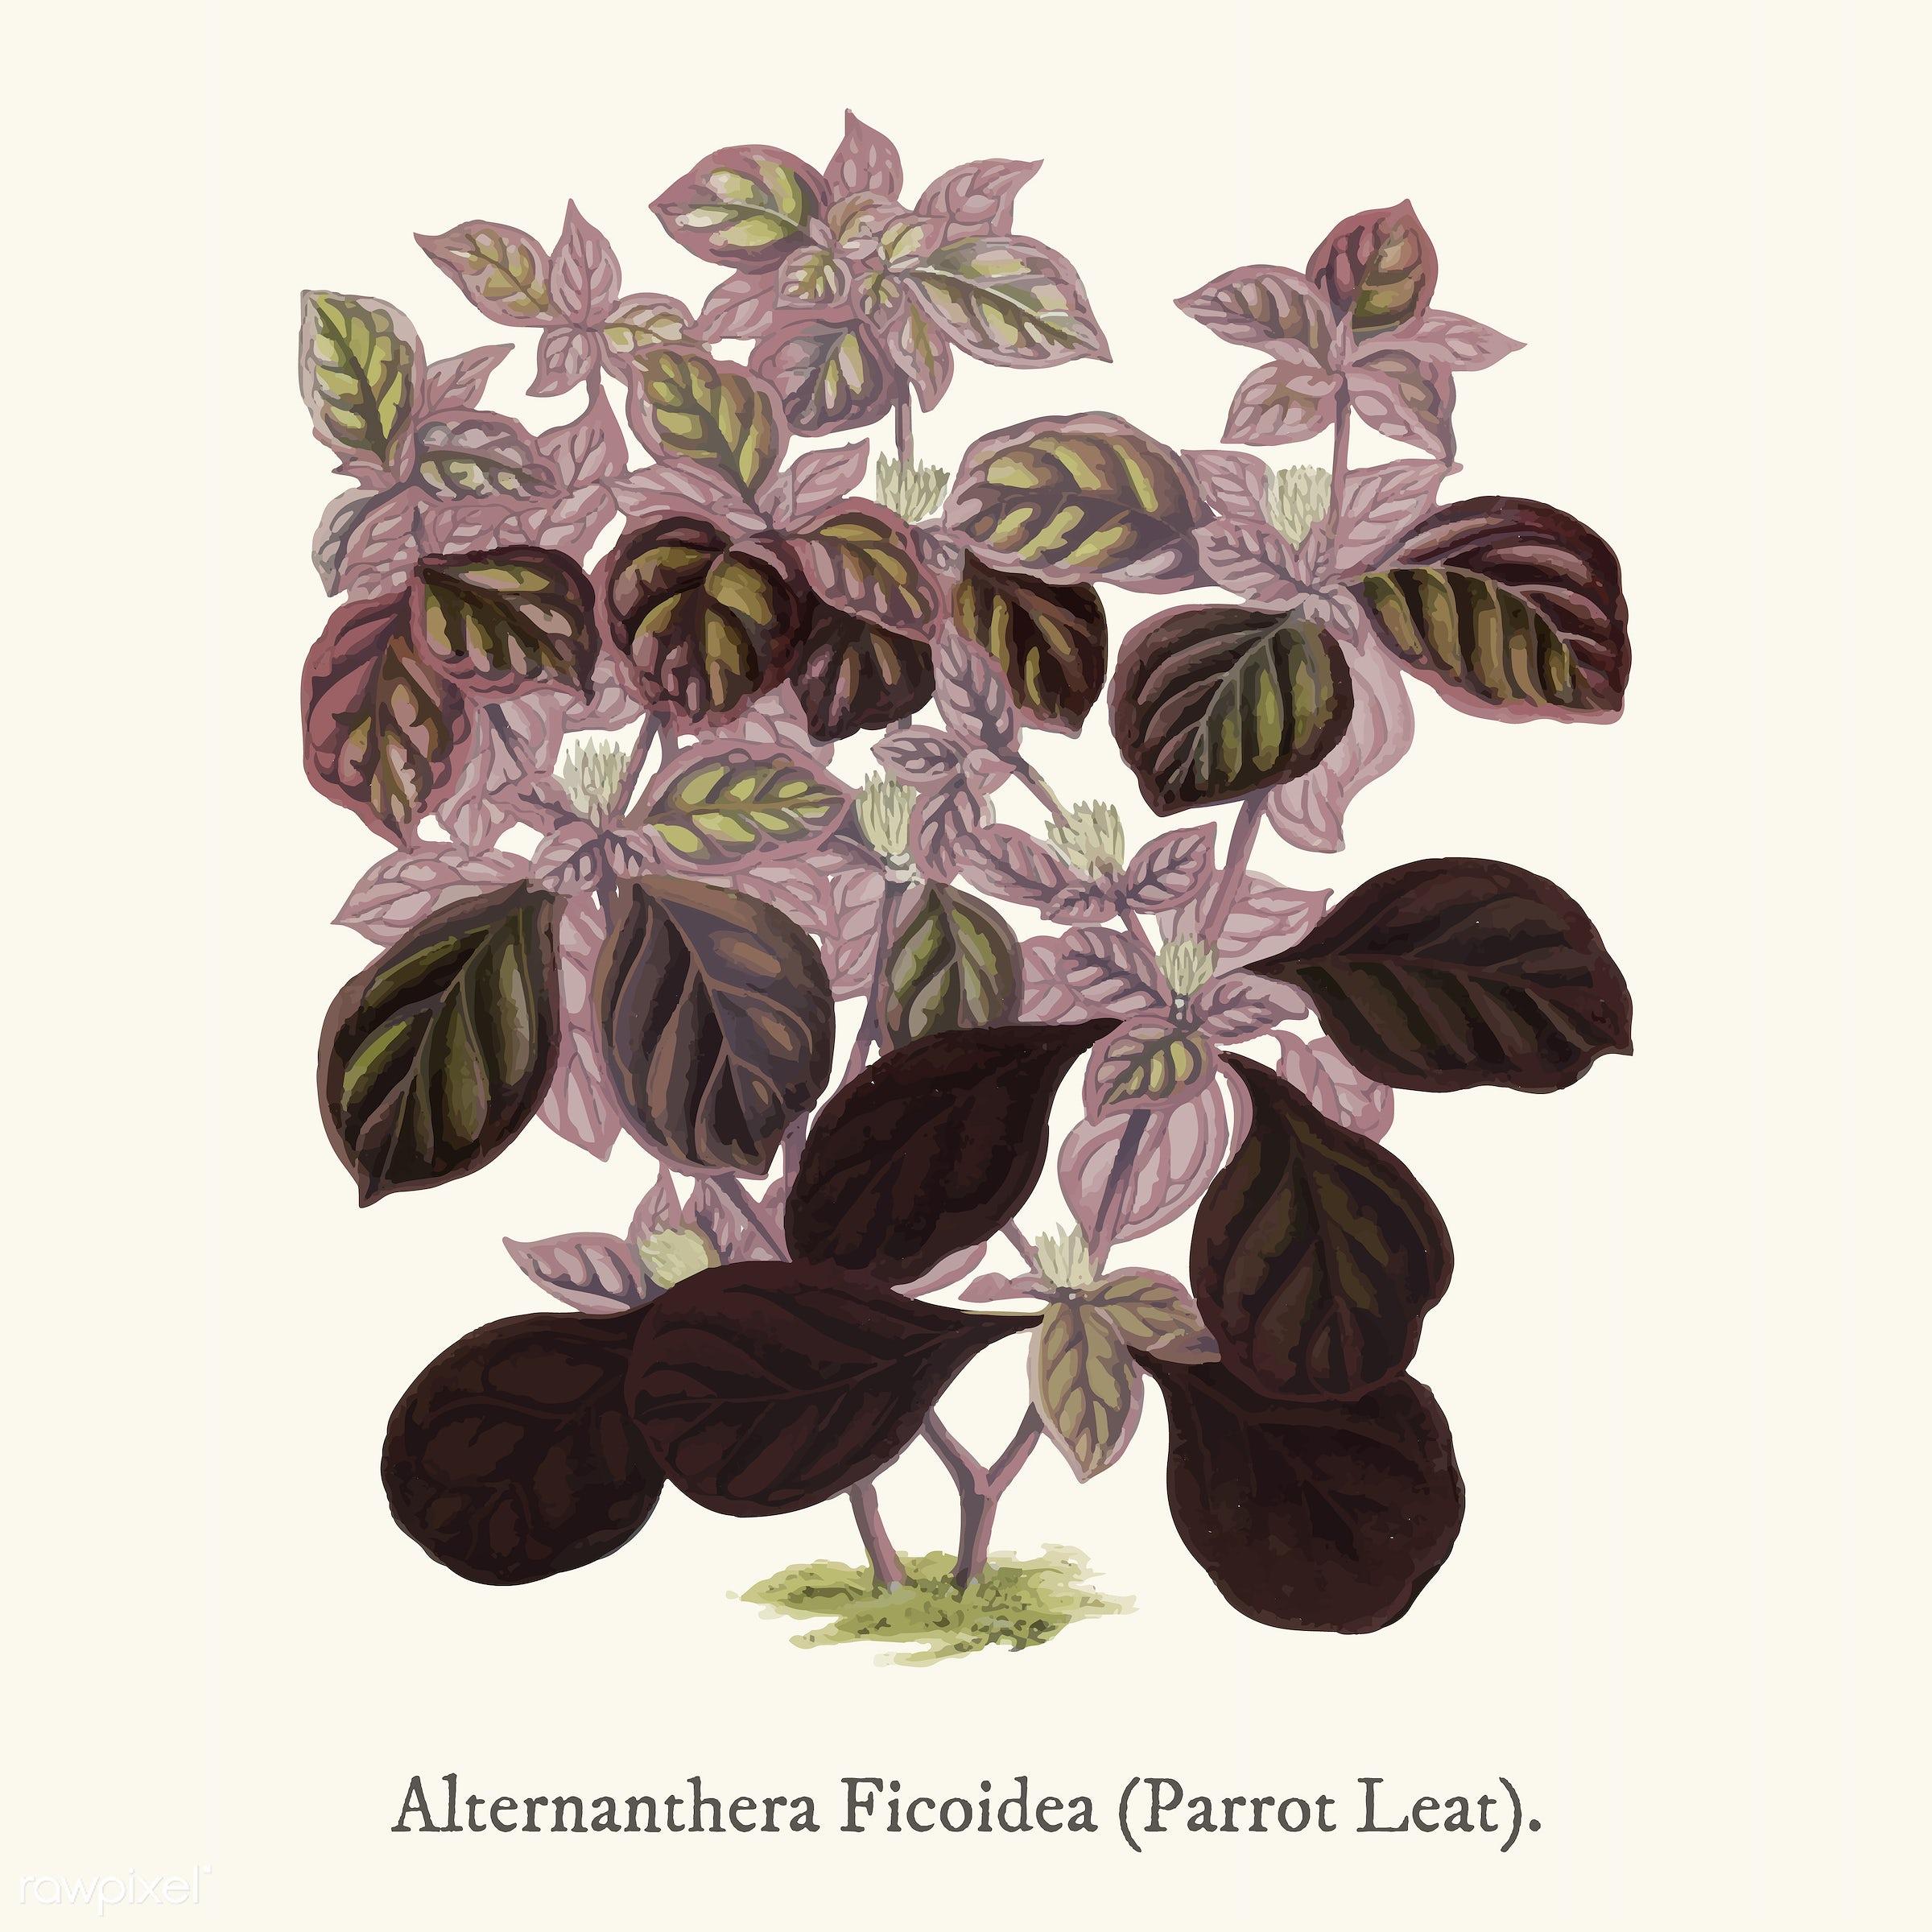 alternanthera ficoidea, alternanthera tenella, ancient, antique, decorate, decoration, design, drawing, ficoidea, graphic,...